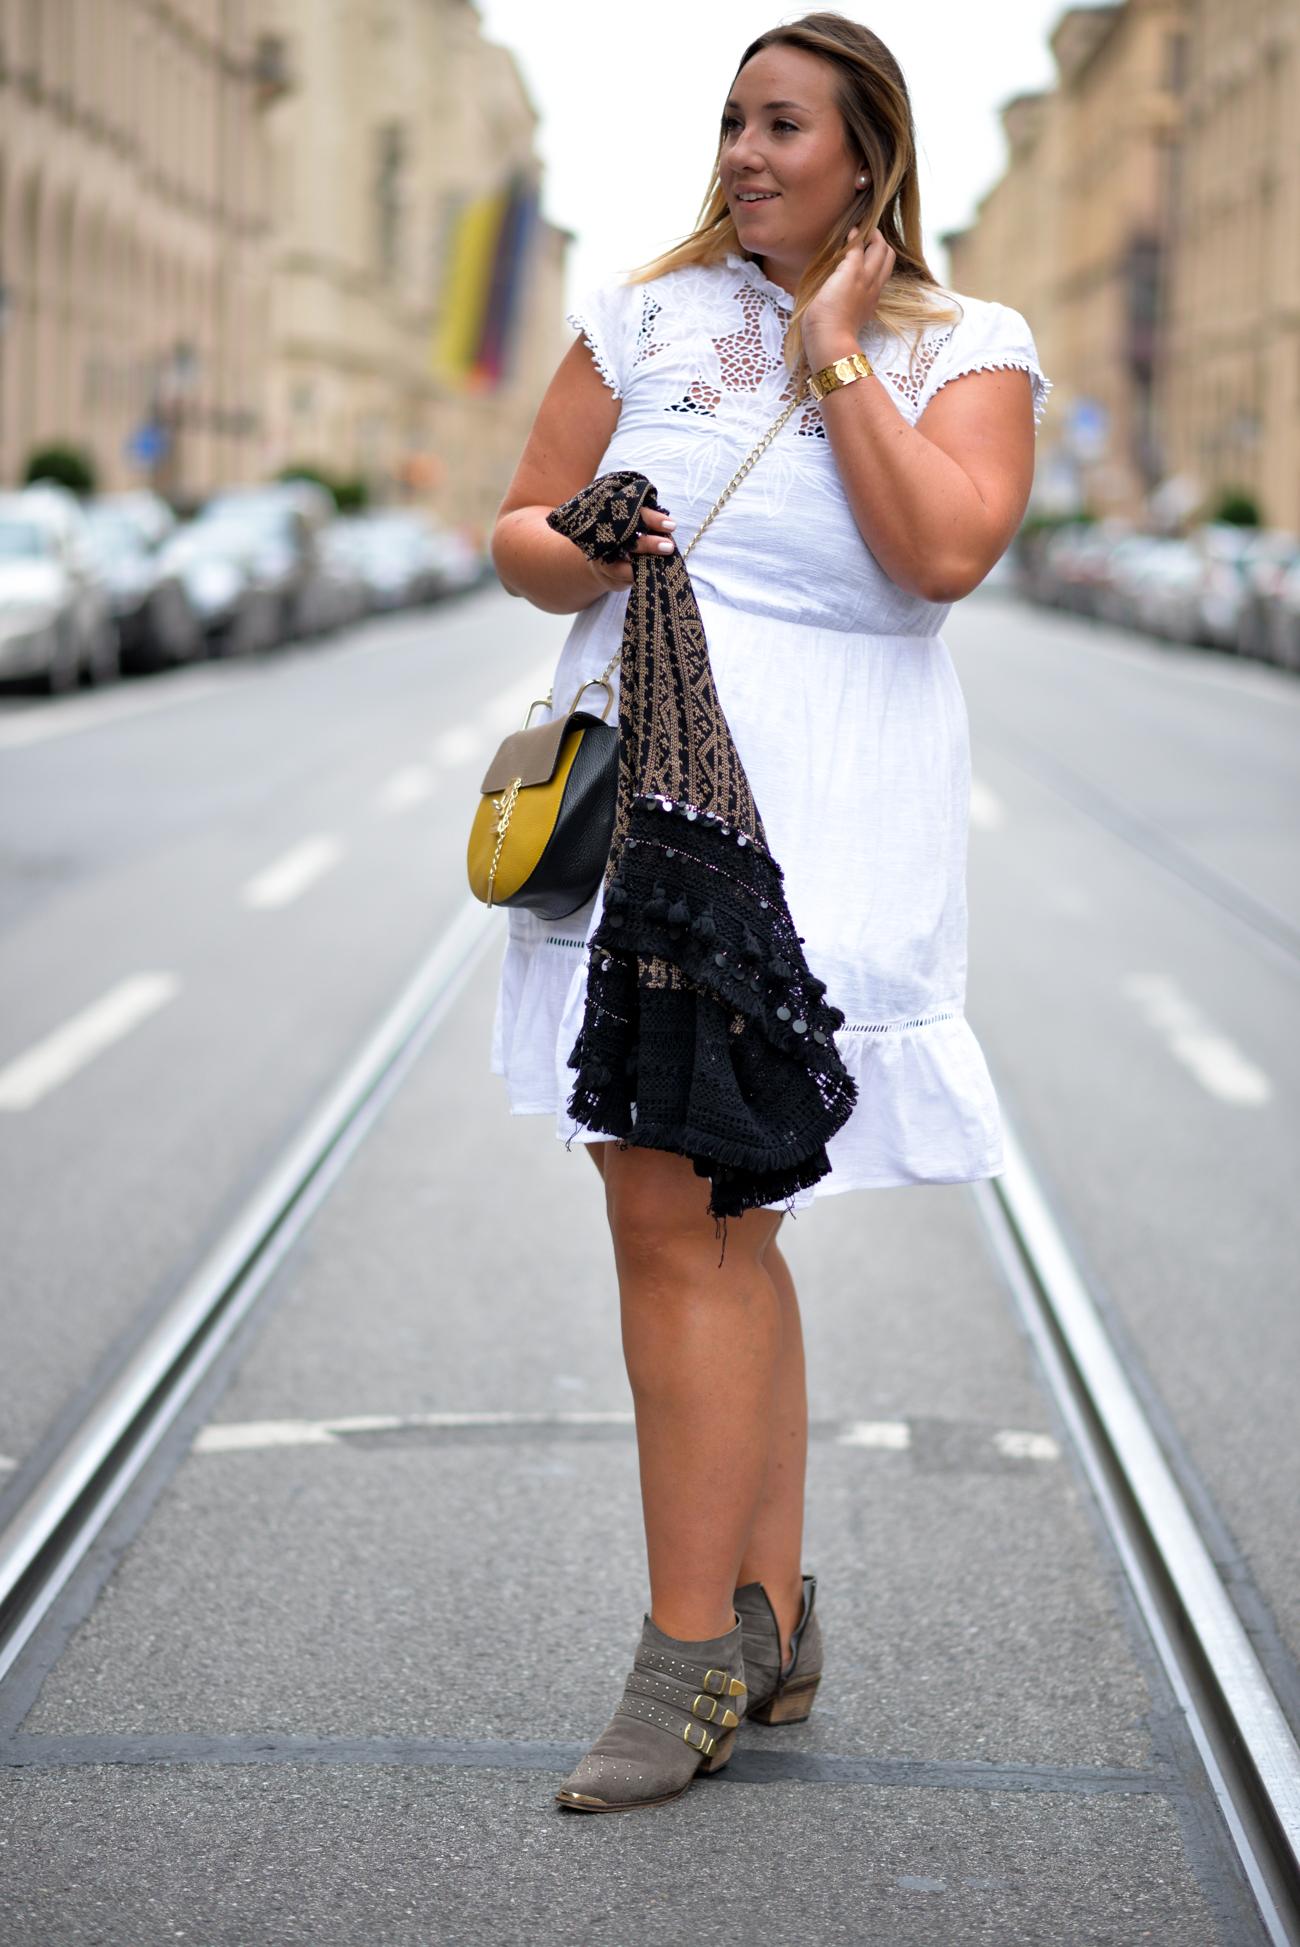 The Skinny and The Curvy One_Plus_Plus Size Blogger_Fashion_Blogger Deutschland_Fashionblogger Munich_Curve (14 von 17)